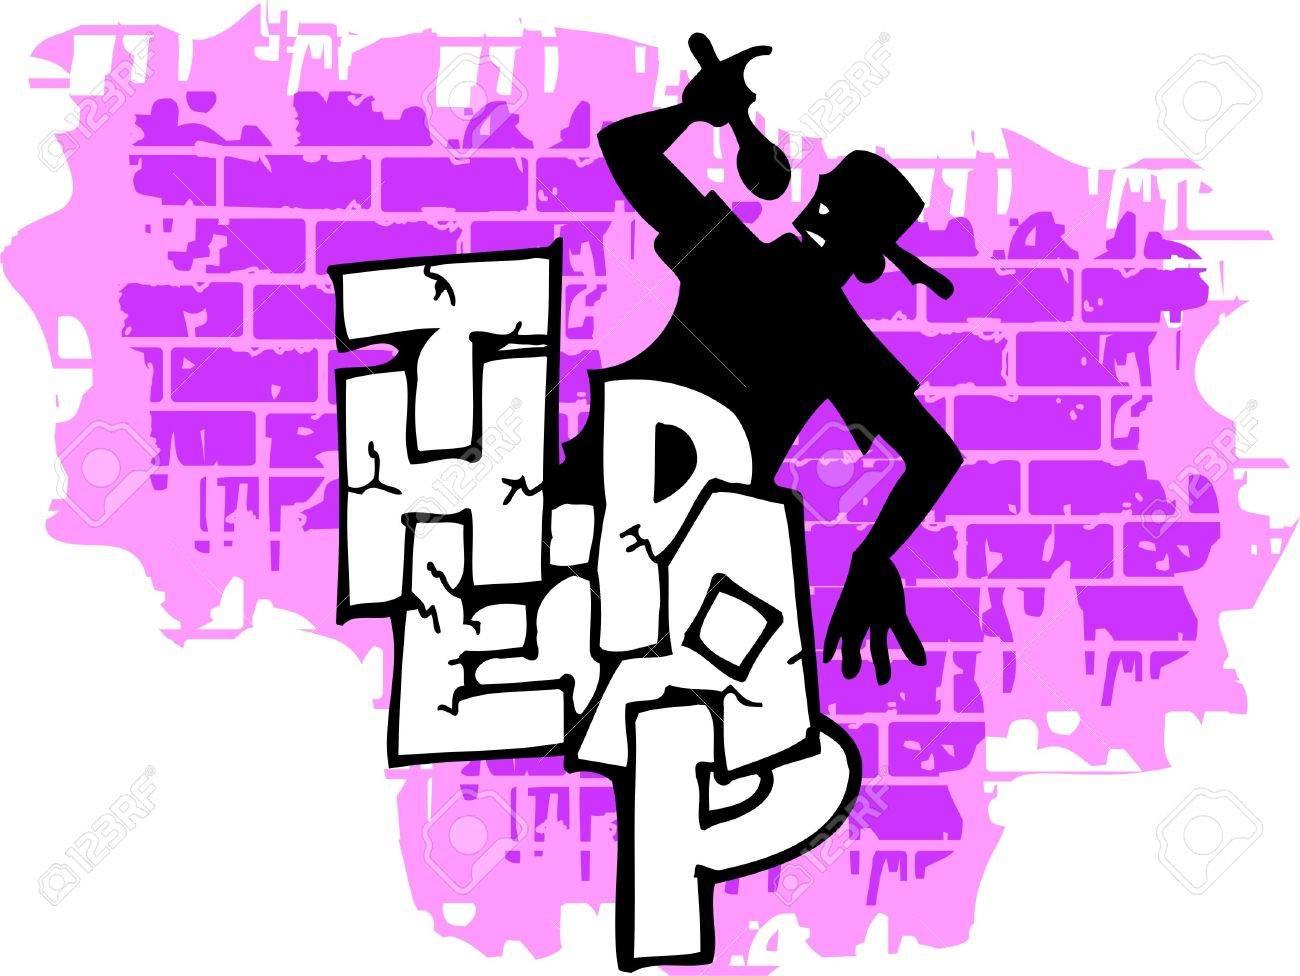 Graffiti wall vinyl - Graffiti Wall And Silhouette Vector Illustration Vinyl Ready Stock Vector